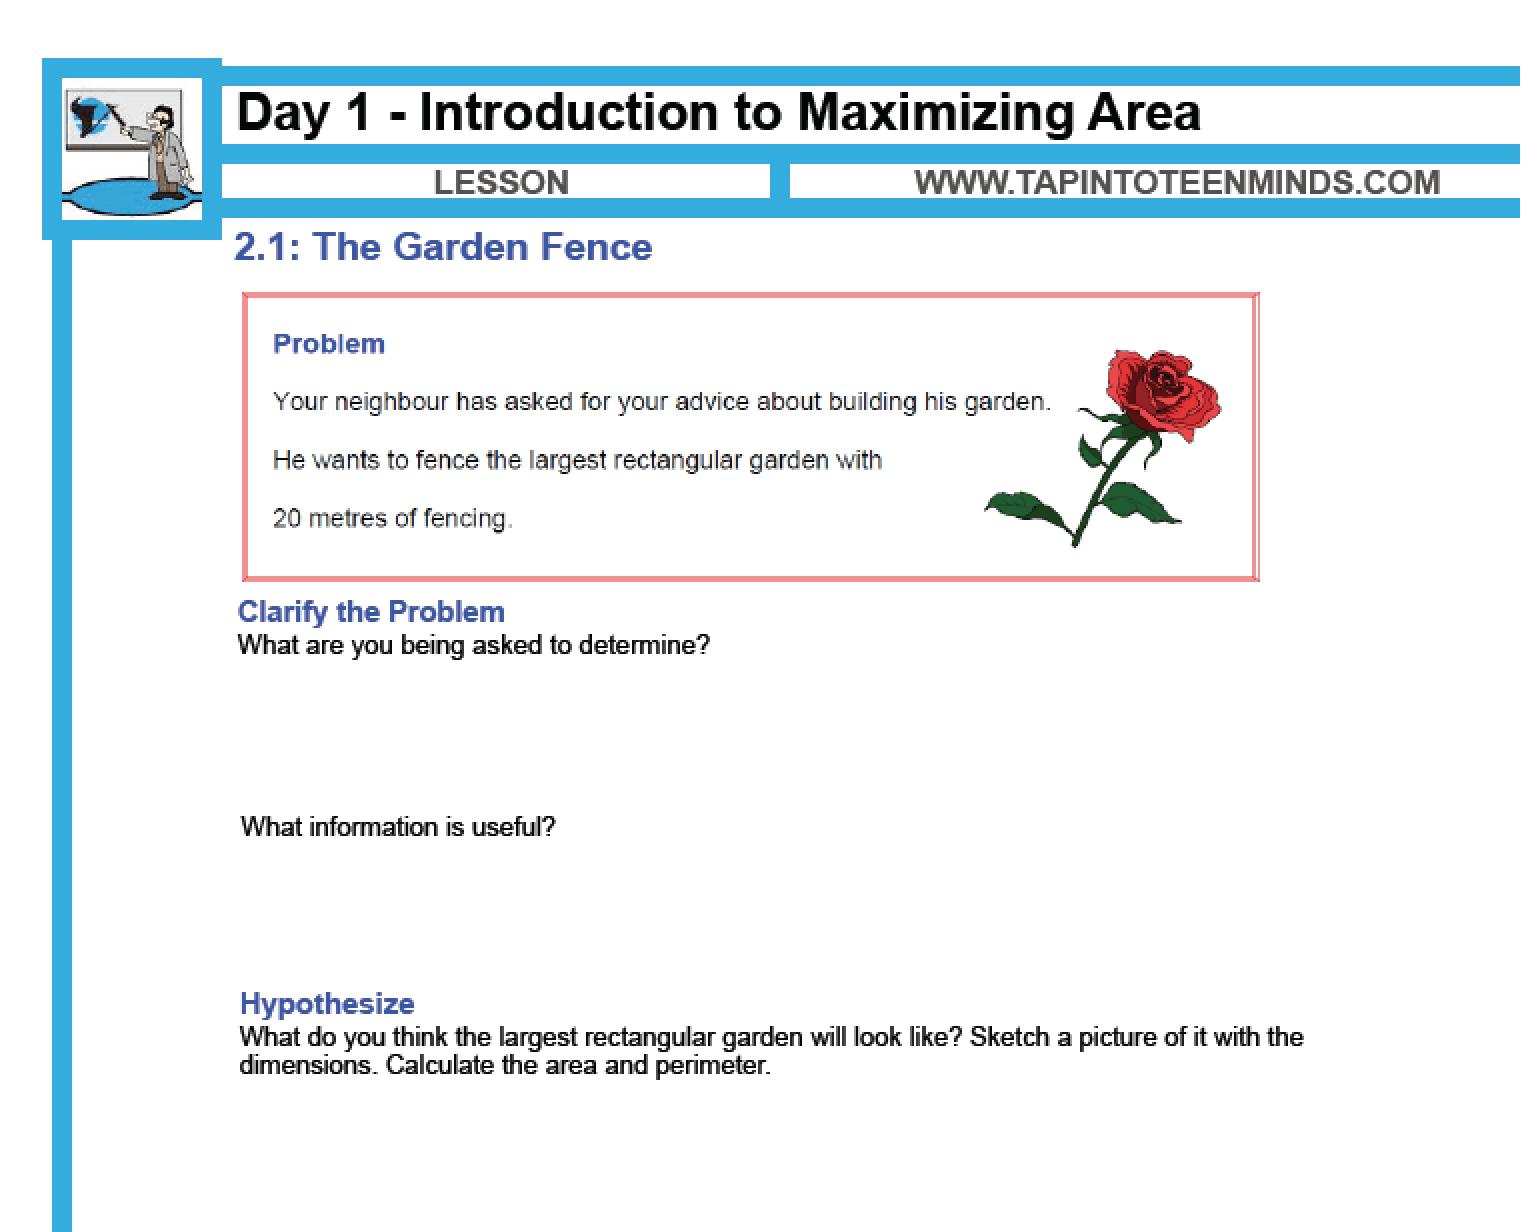 2.1 – Introduction to Maximizing Area